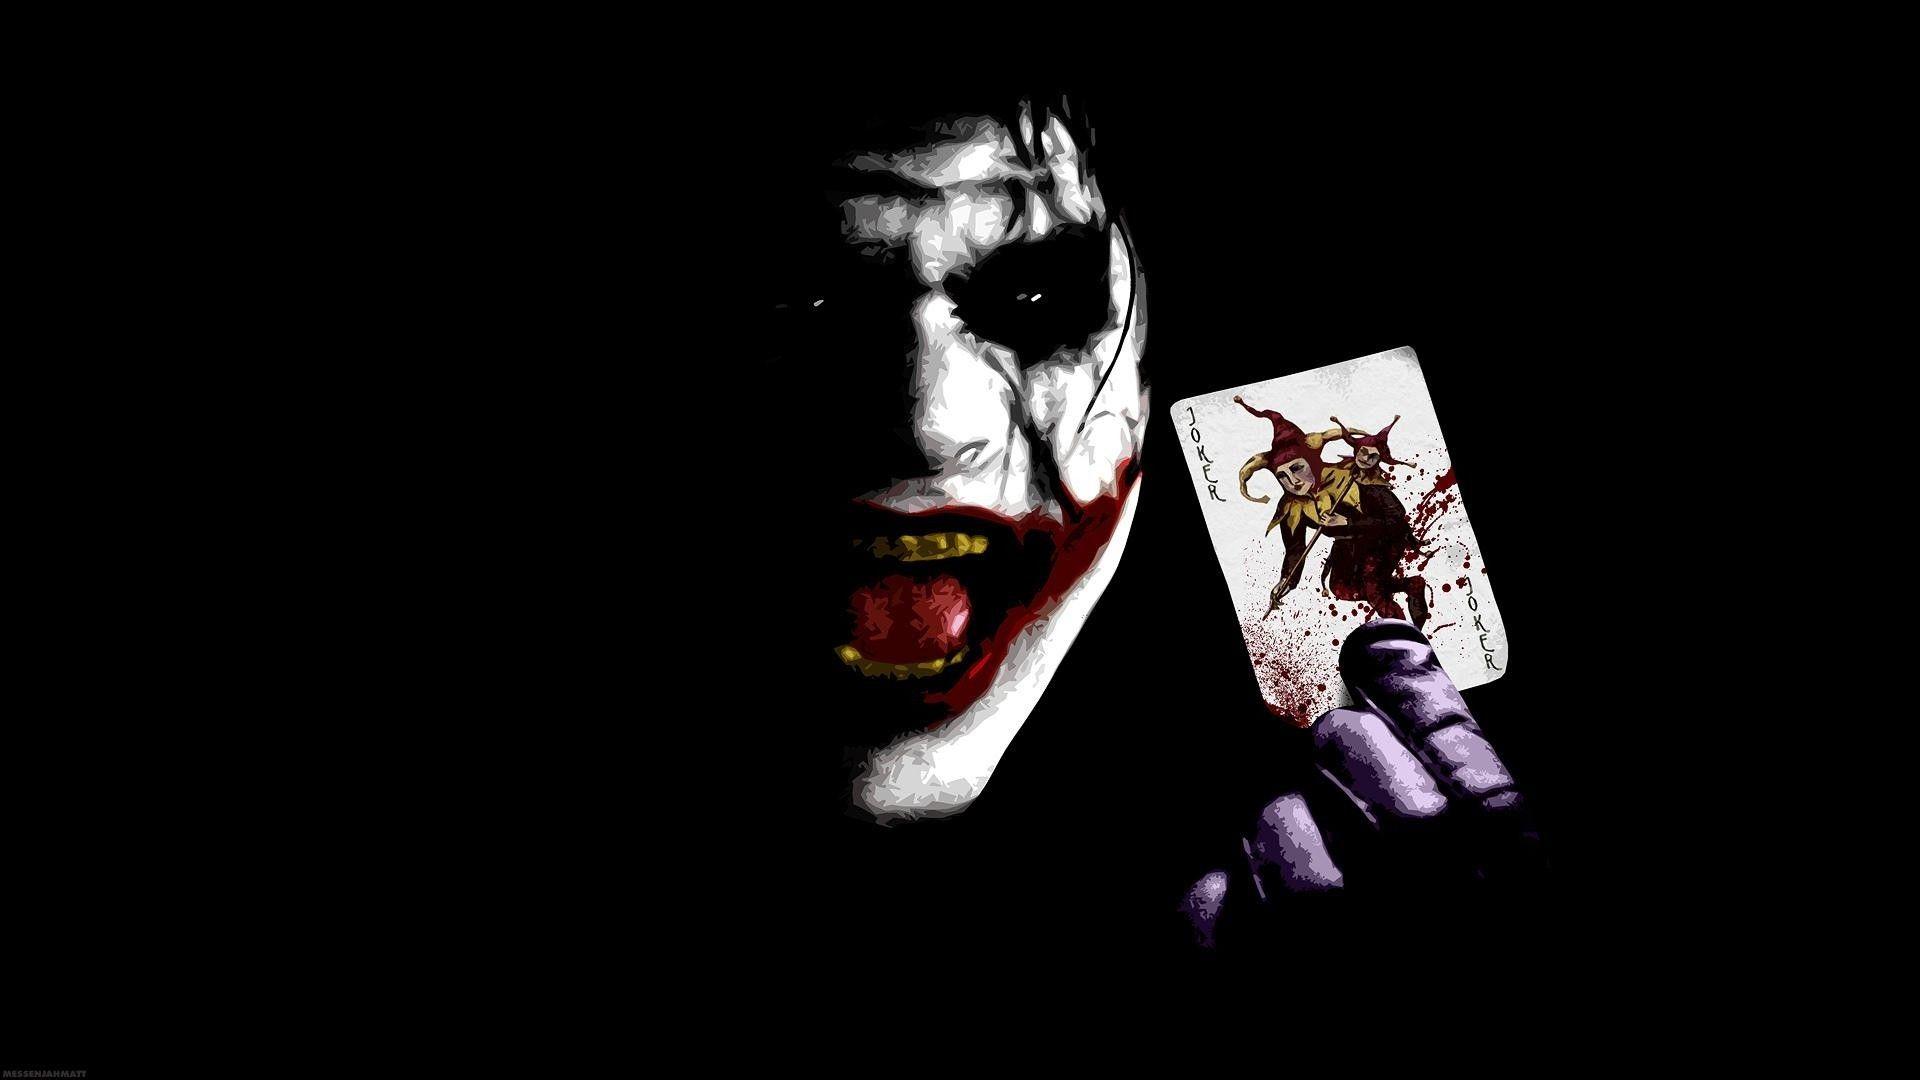 HD Cool Wallpapers Pc and Ipad Desktop   Hd Wallpaper Full   Joker wallpapers, Batman wallpaper ...